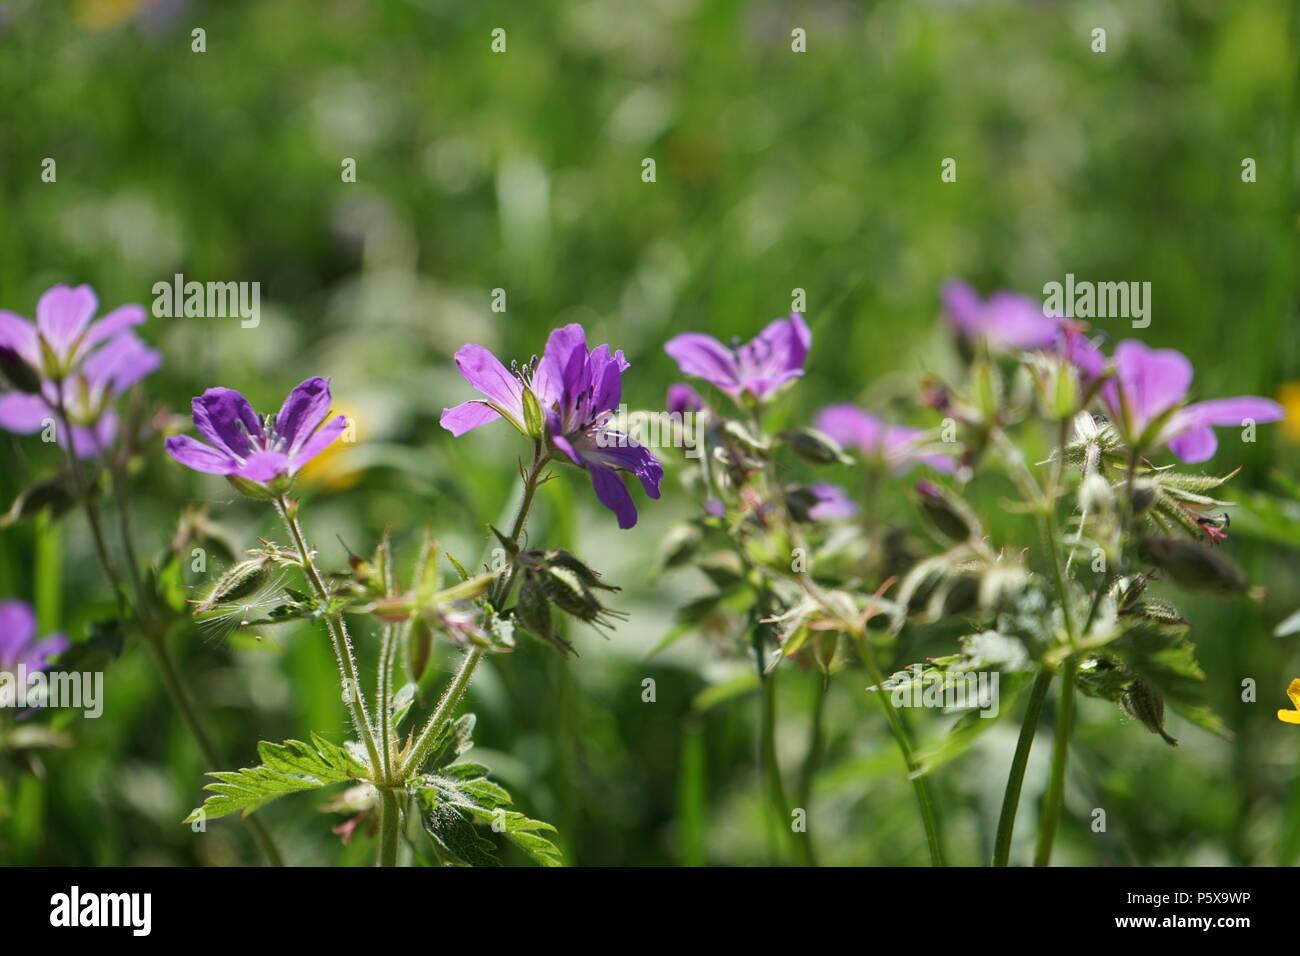 Storchschnabel, Wiese, Geranium - Stock Image